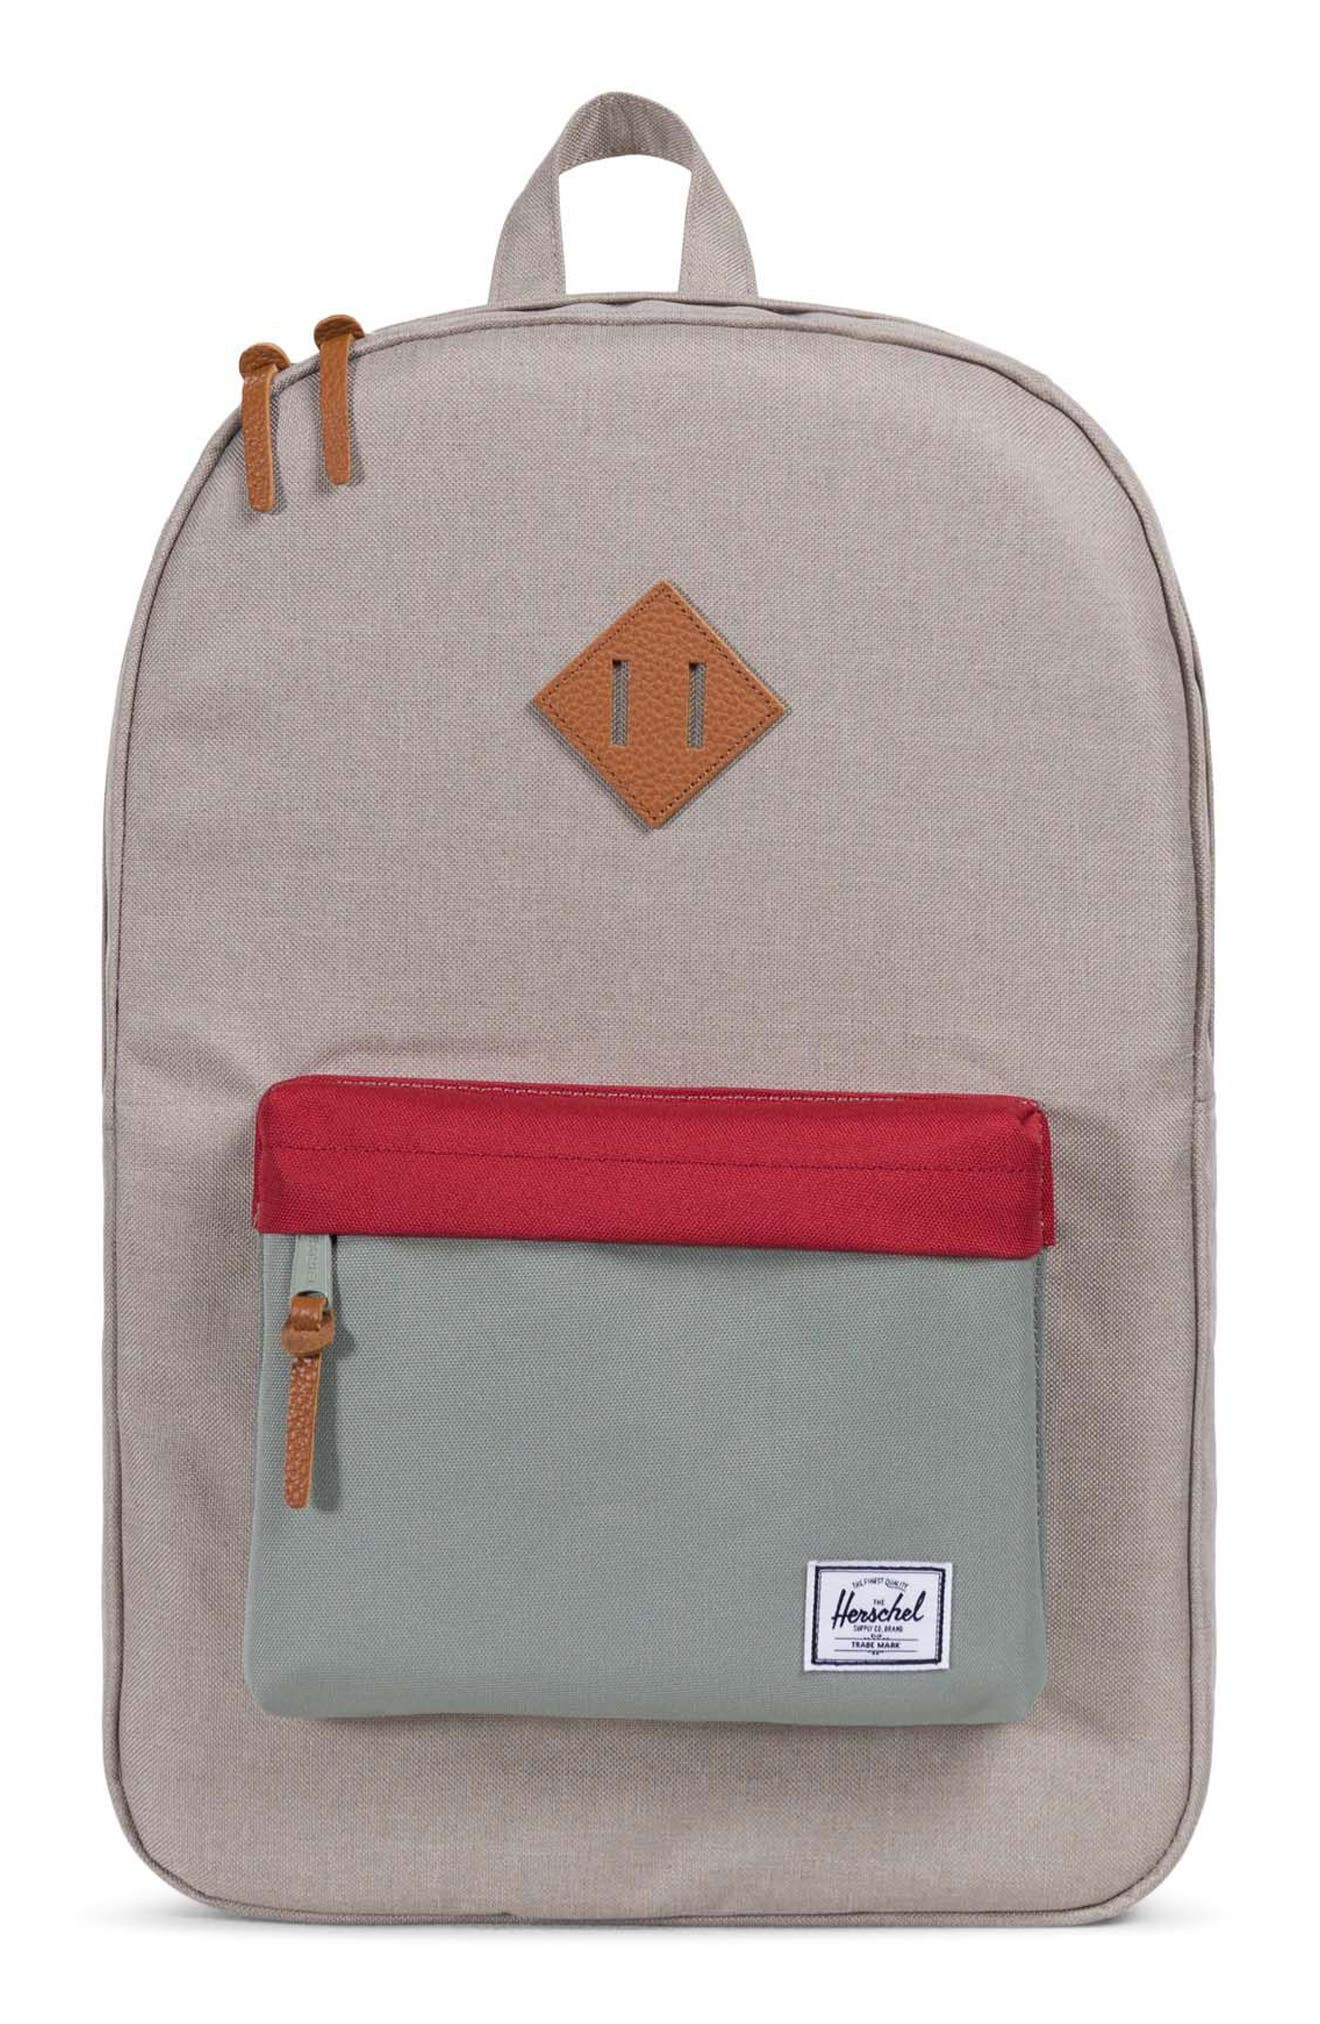 Heritage Backpack,                         Main,                         color, Khaki/ Shadow/ Brick Red/ Tan